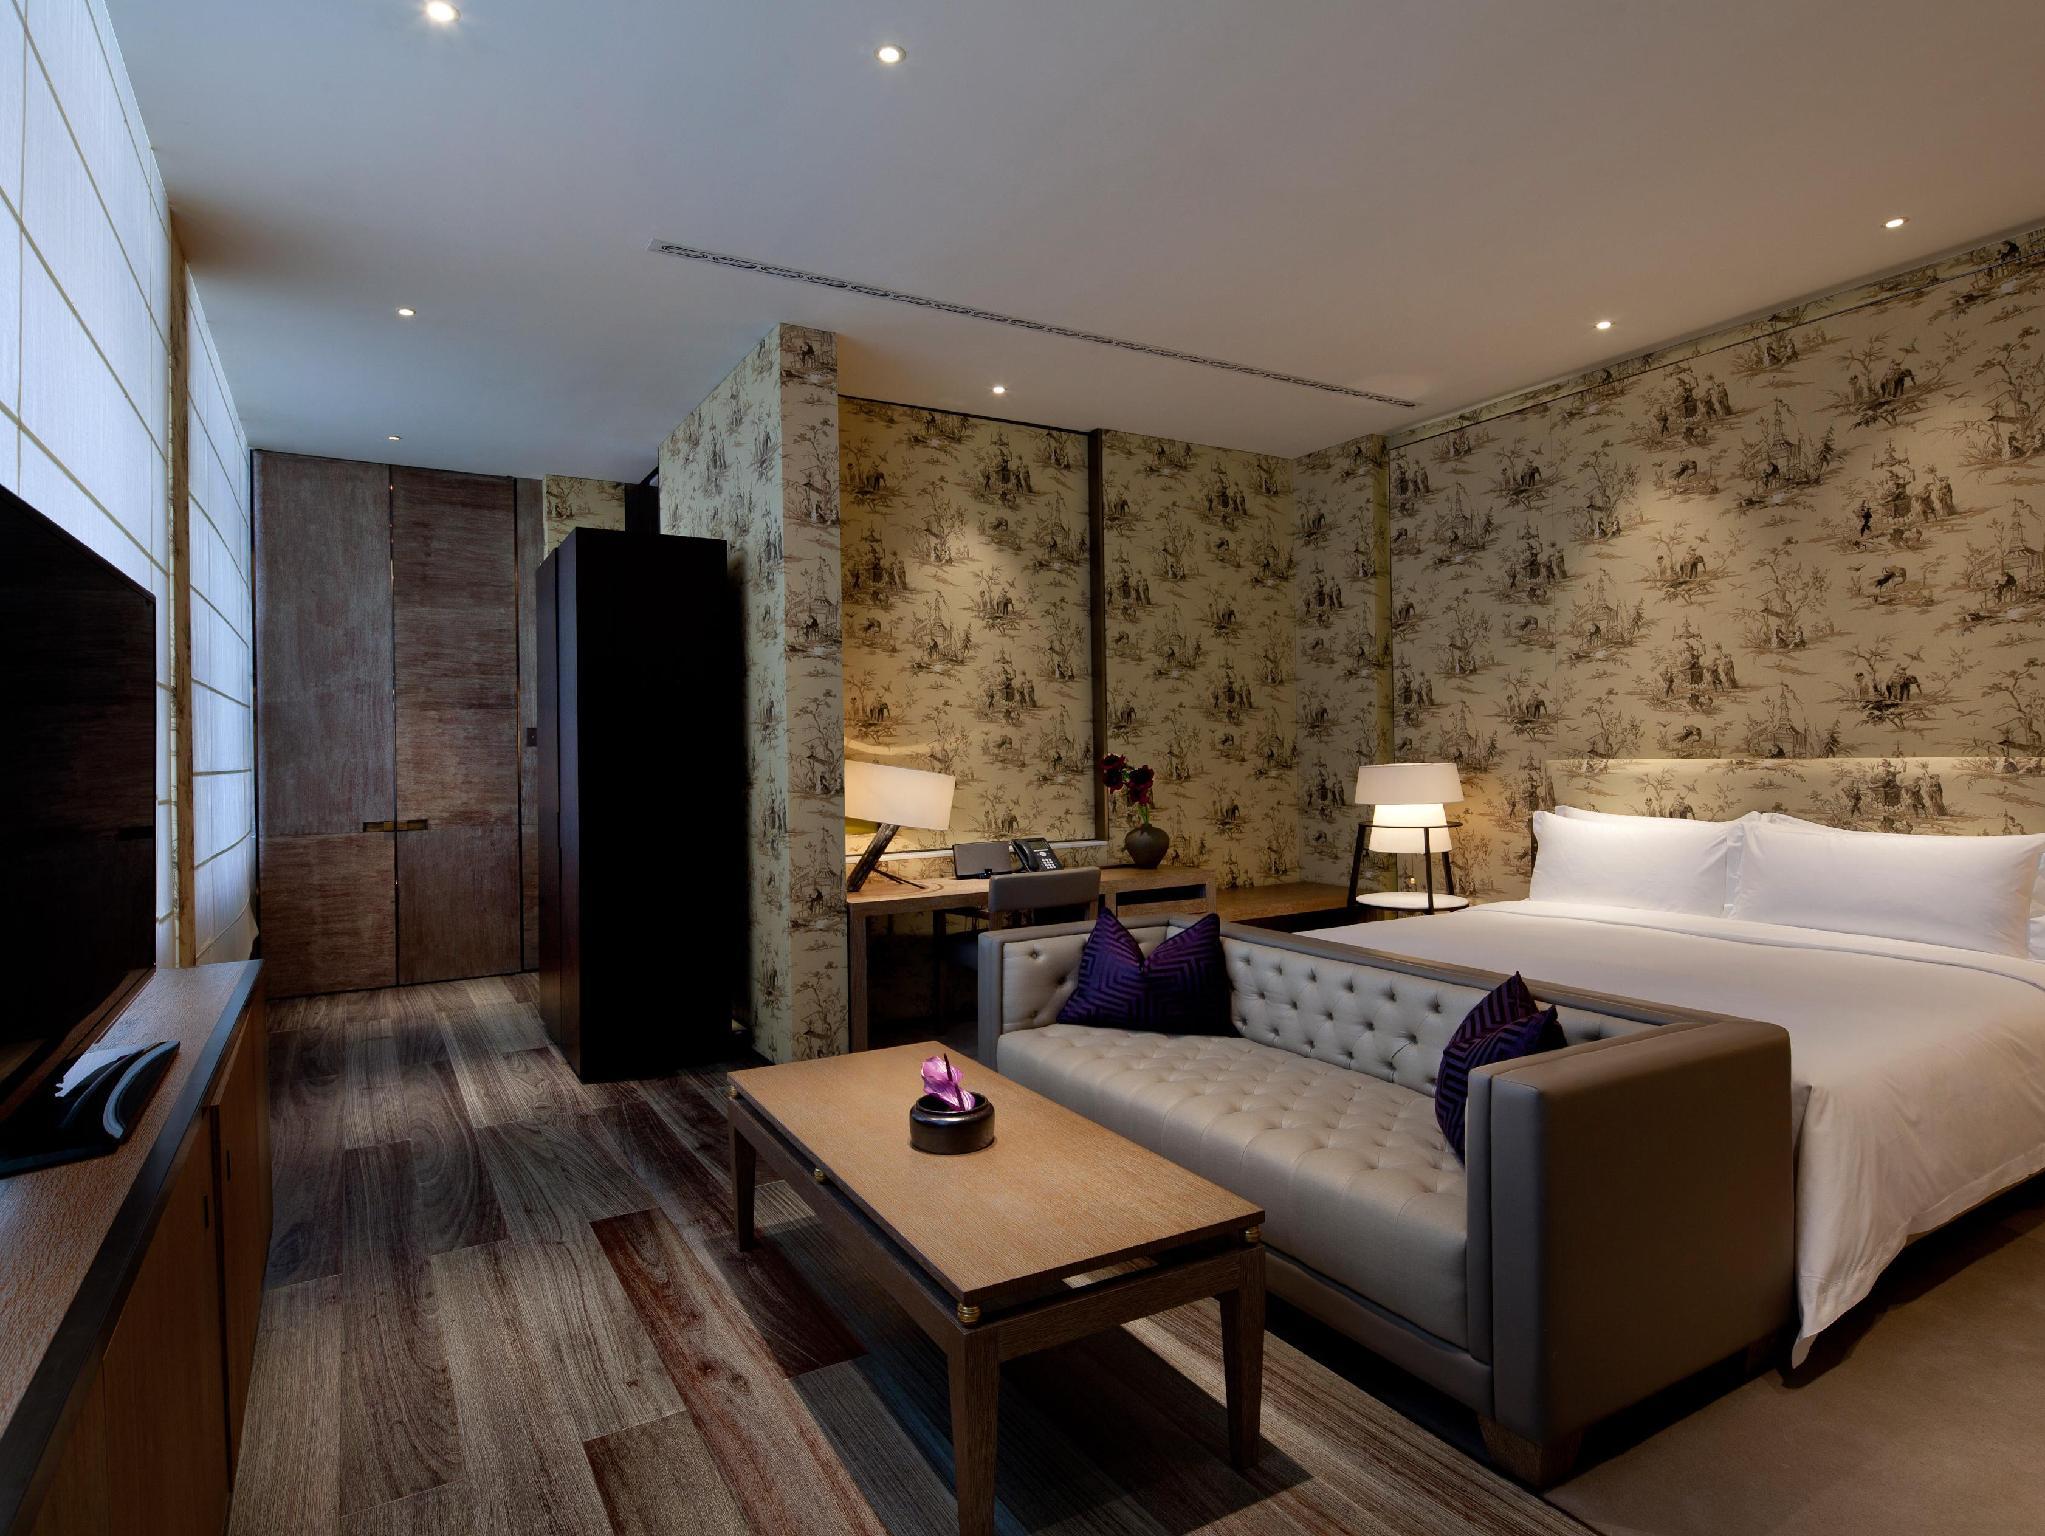 Hotel Desa Bahasa Borobudur - Superior 21 - Jl. Makadam, Dusun Parakan, Ngargogondo, Borobudur, Magelang, Jawa Tengah - Magelang